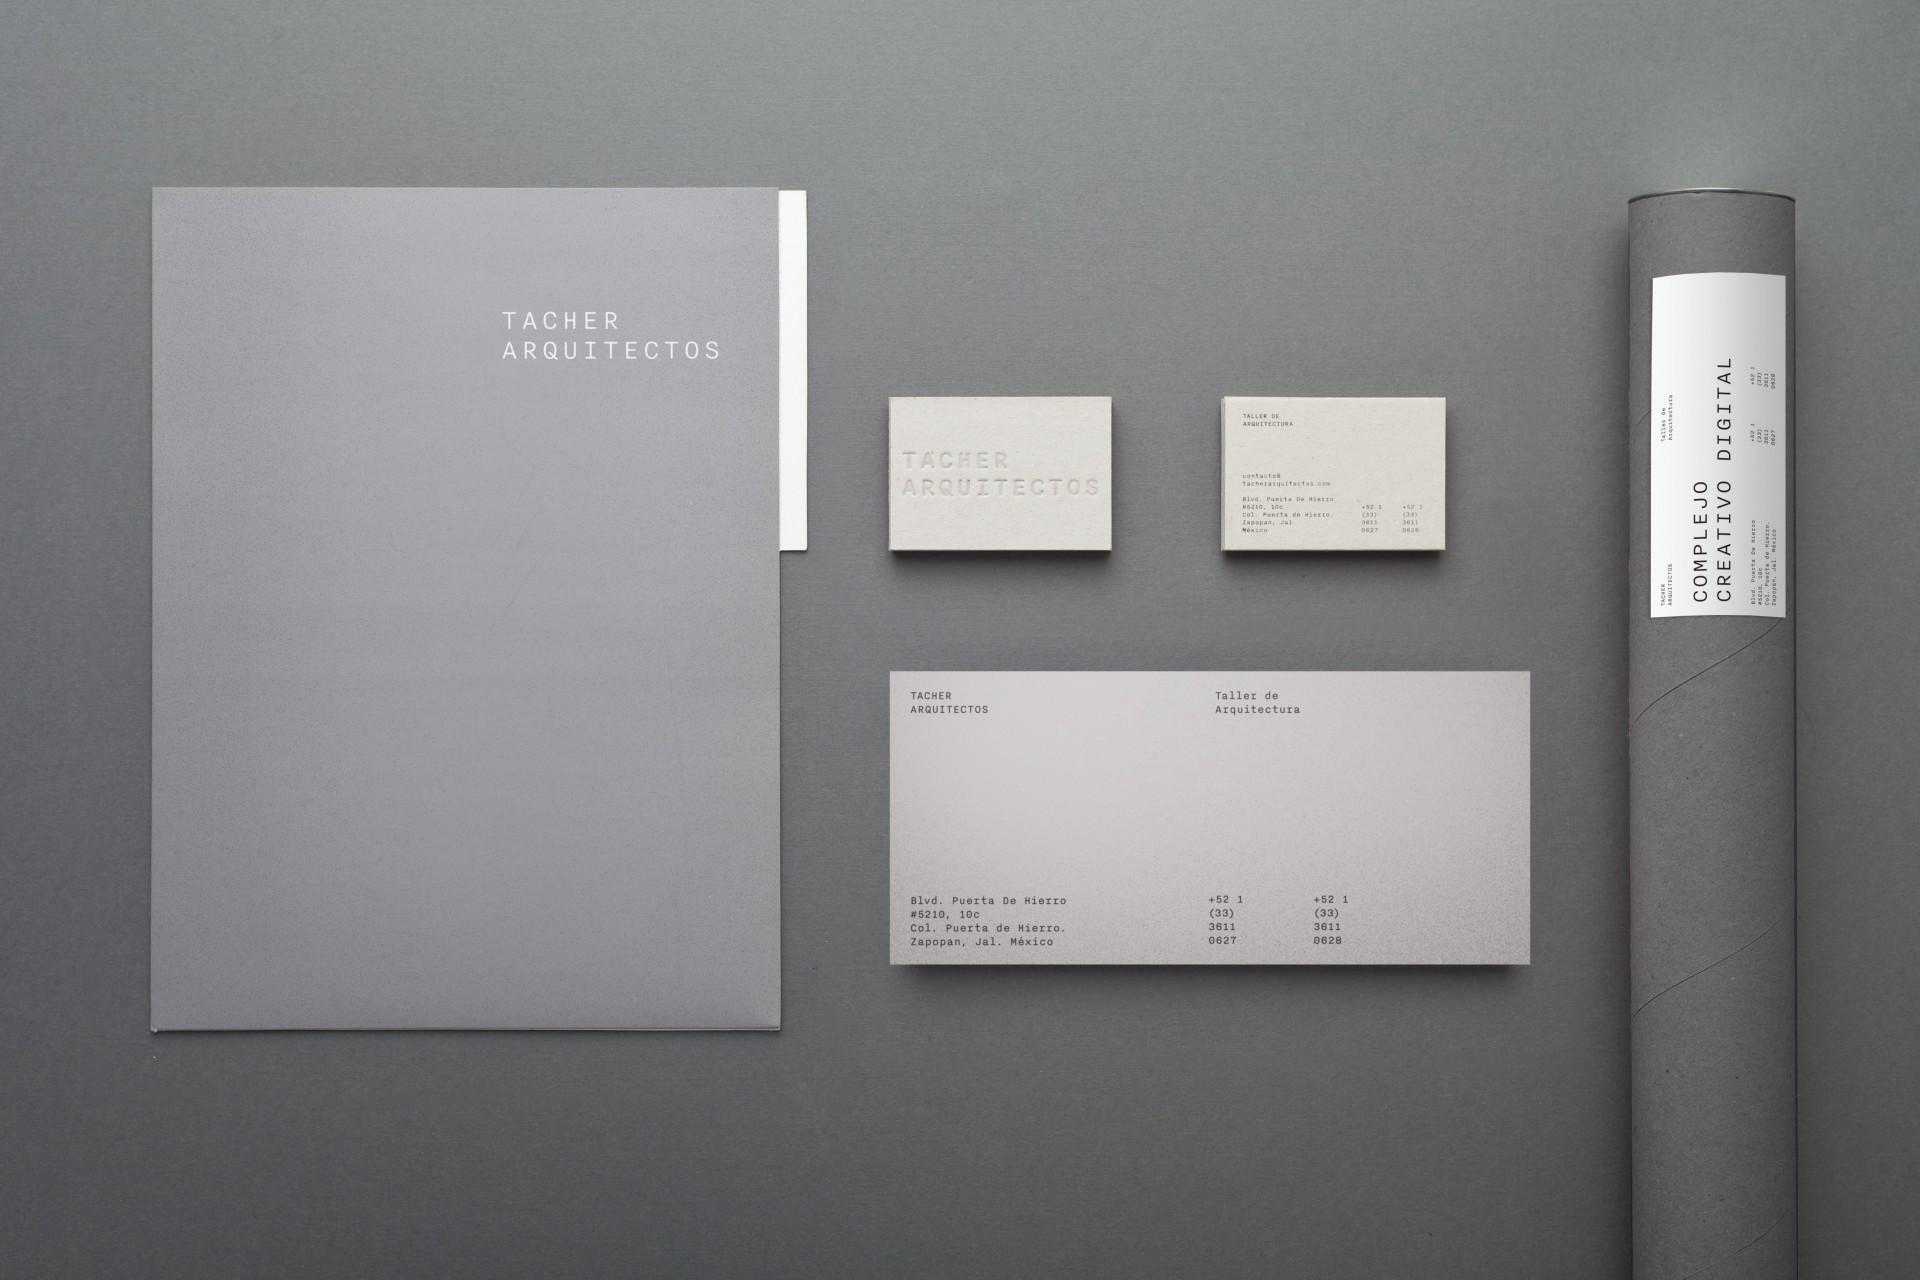 TACHER-Piezas-General copy